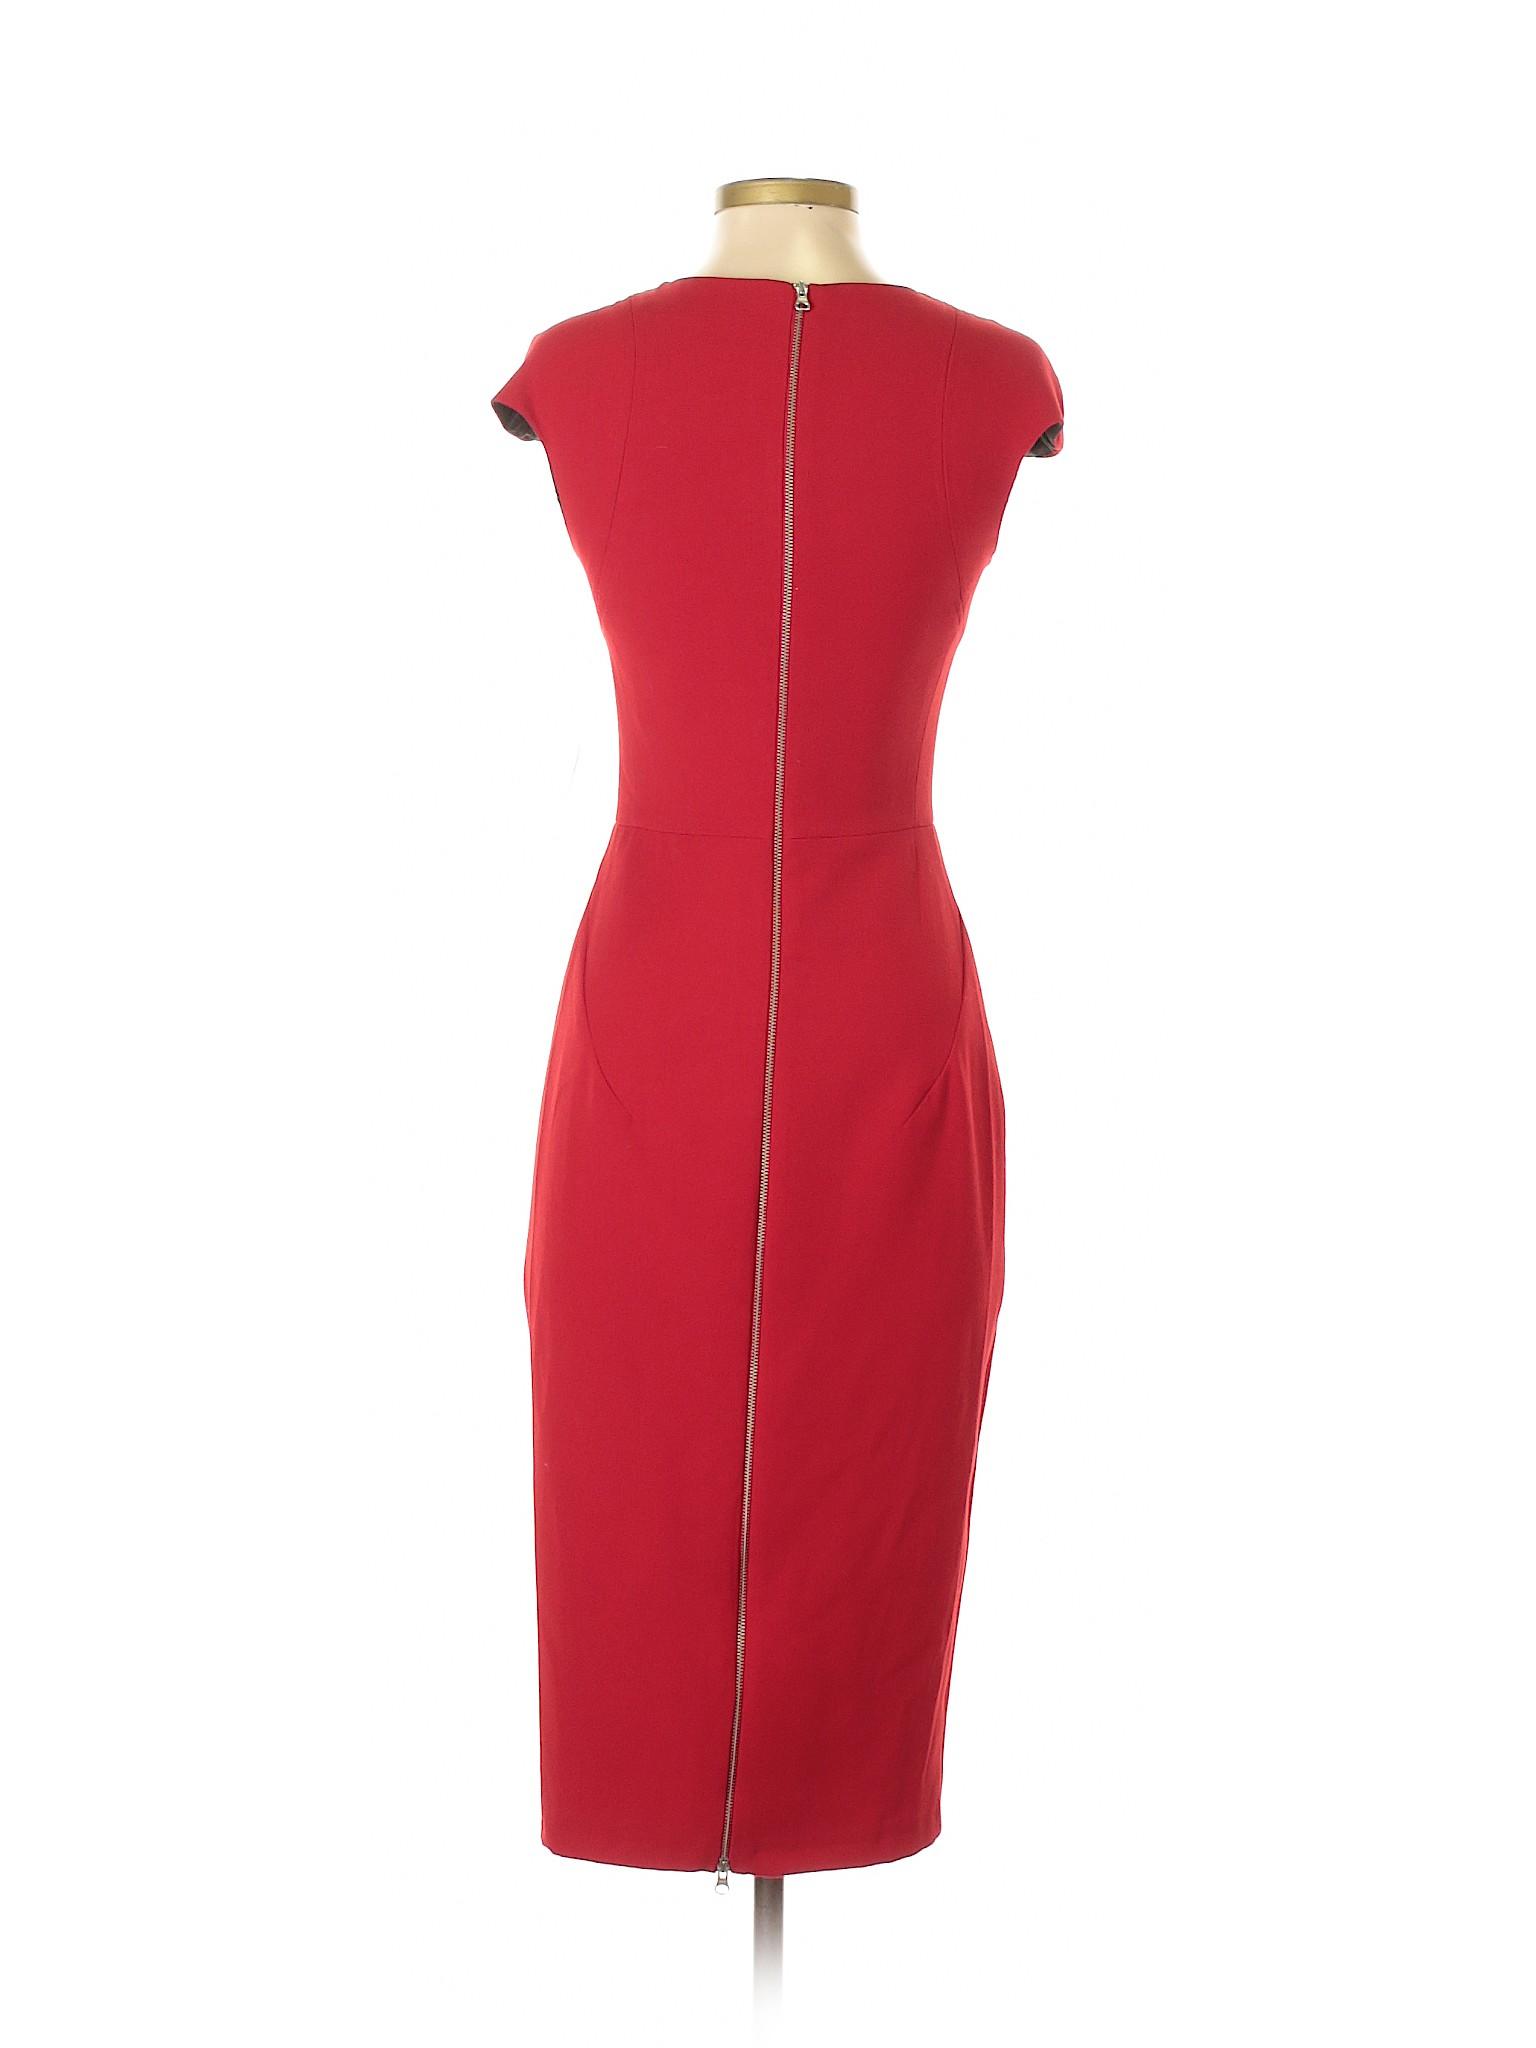 Selling Zara Basic Cocktail Zara Dress Zara Cocktail Dress Selling Basic Basic Selling fgWq1wwTH